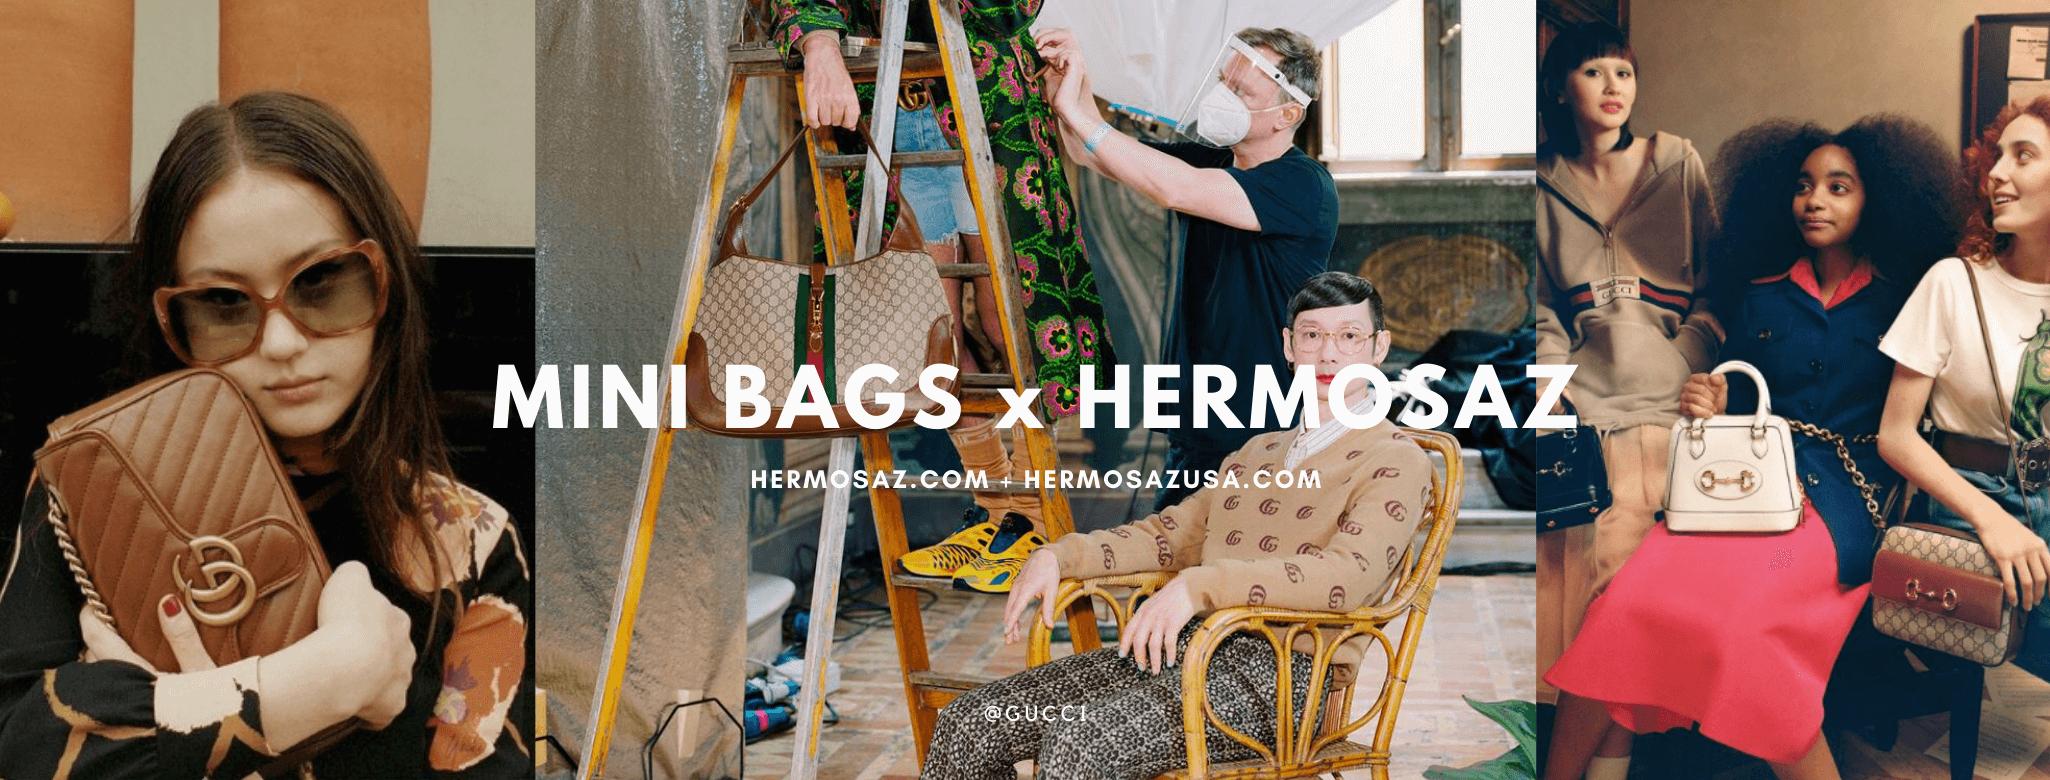 Mini Bags x Hermosaz